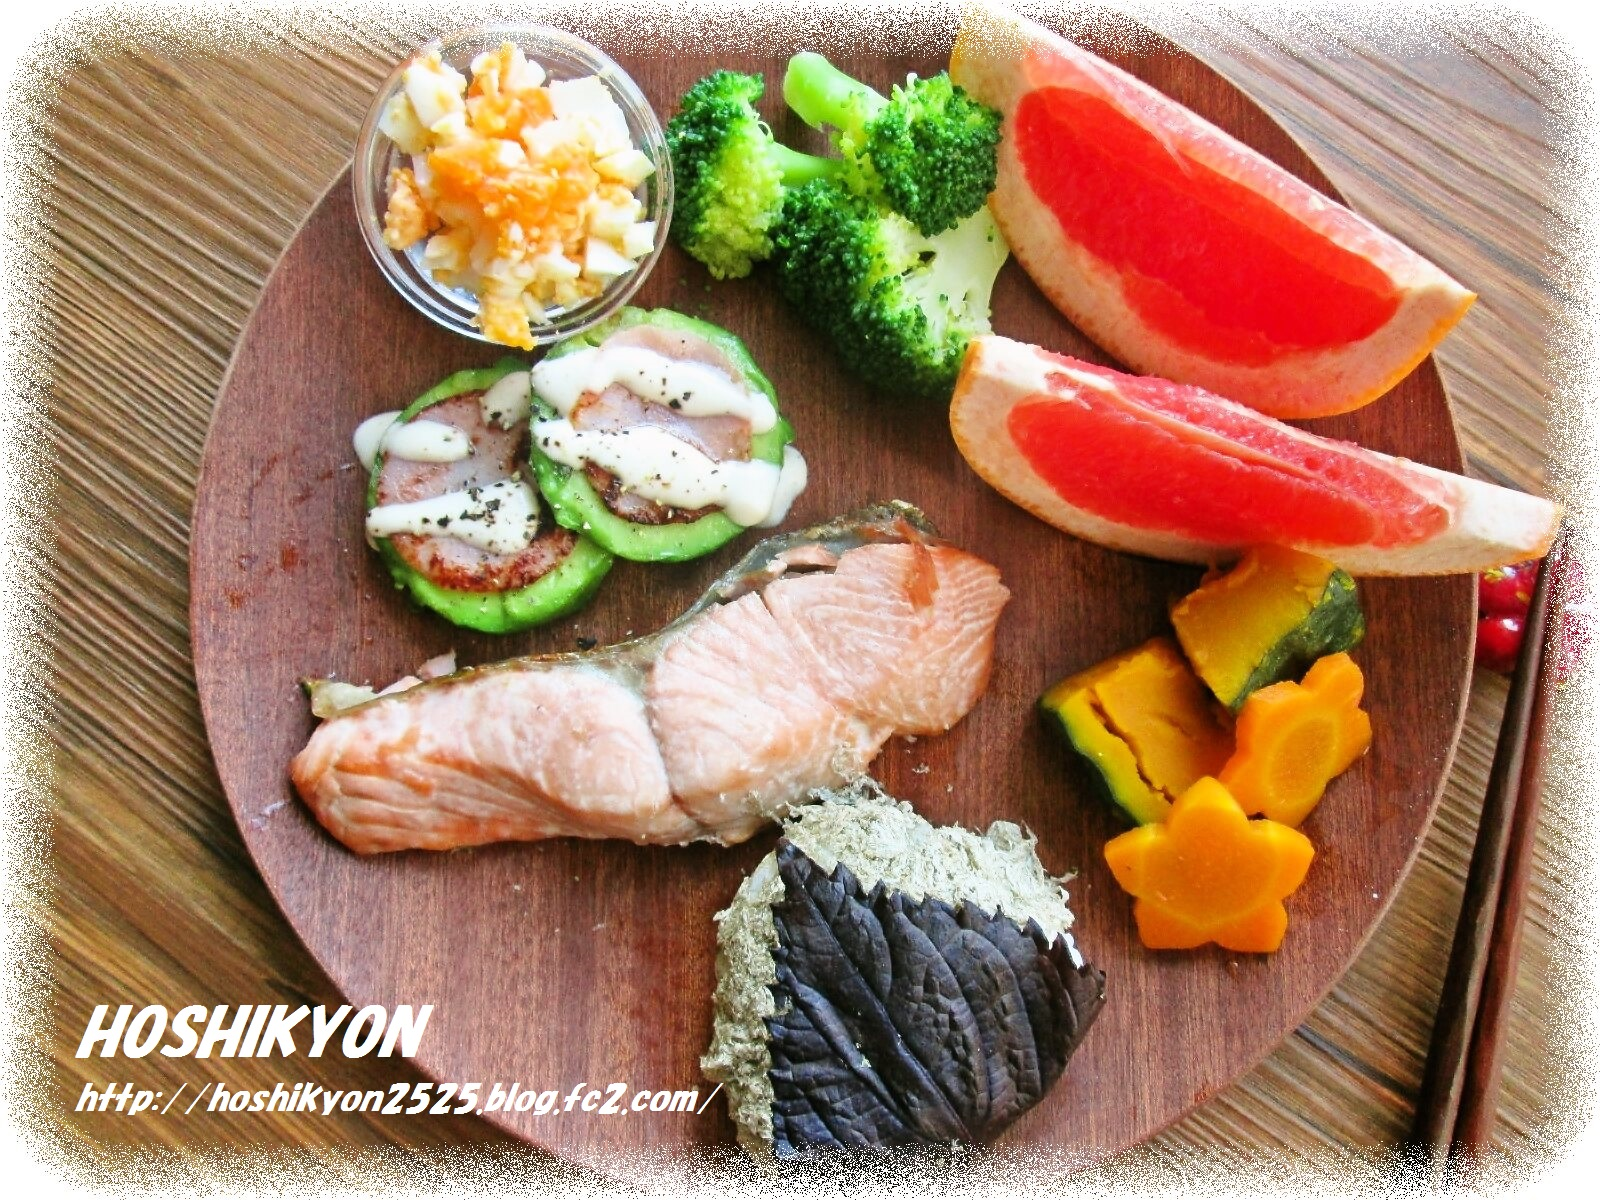 _foodpic5400751.jpg